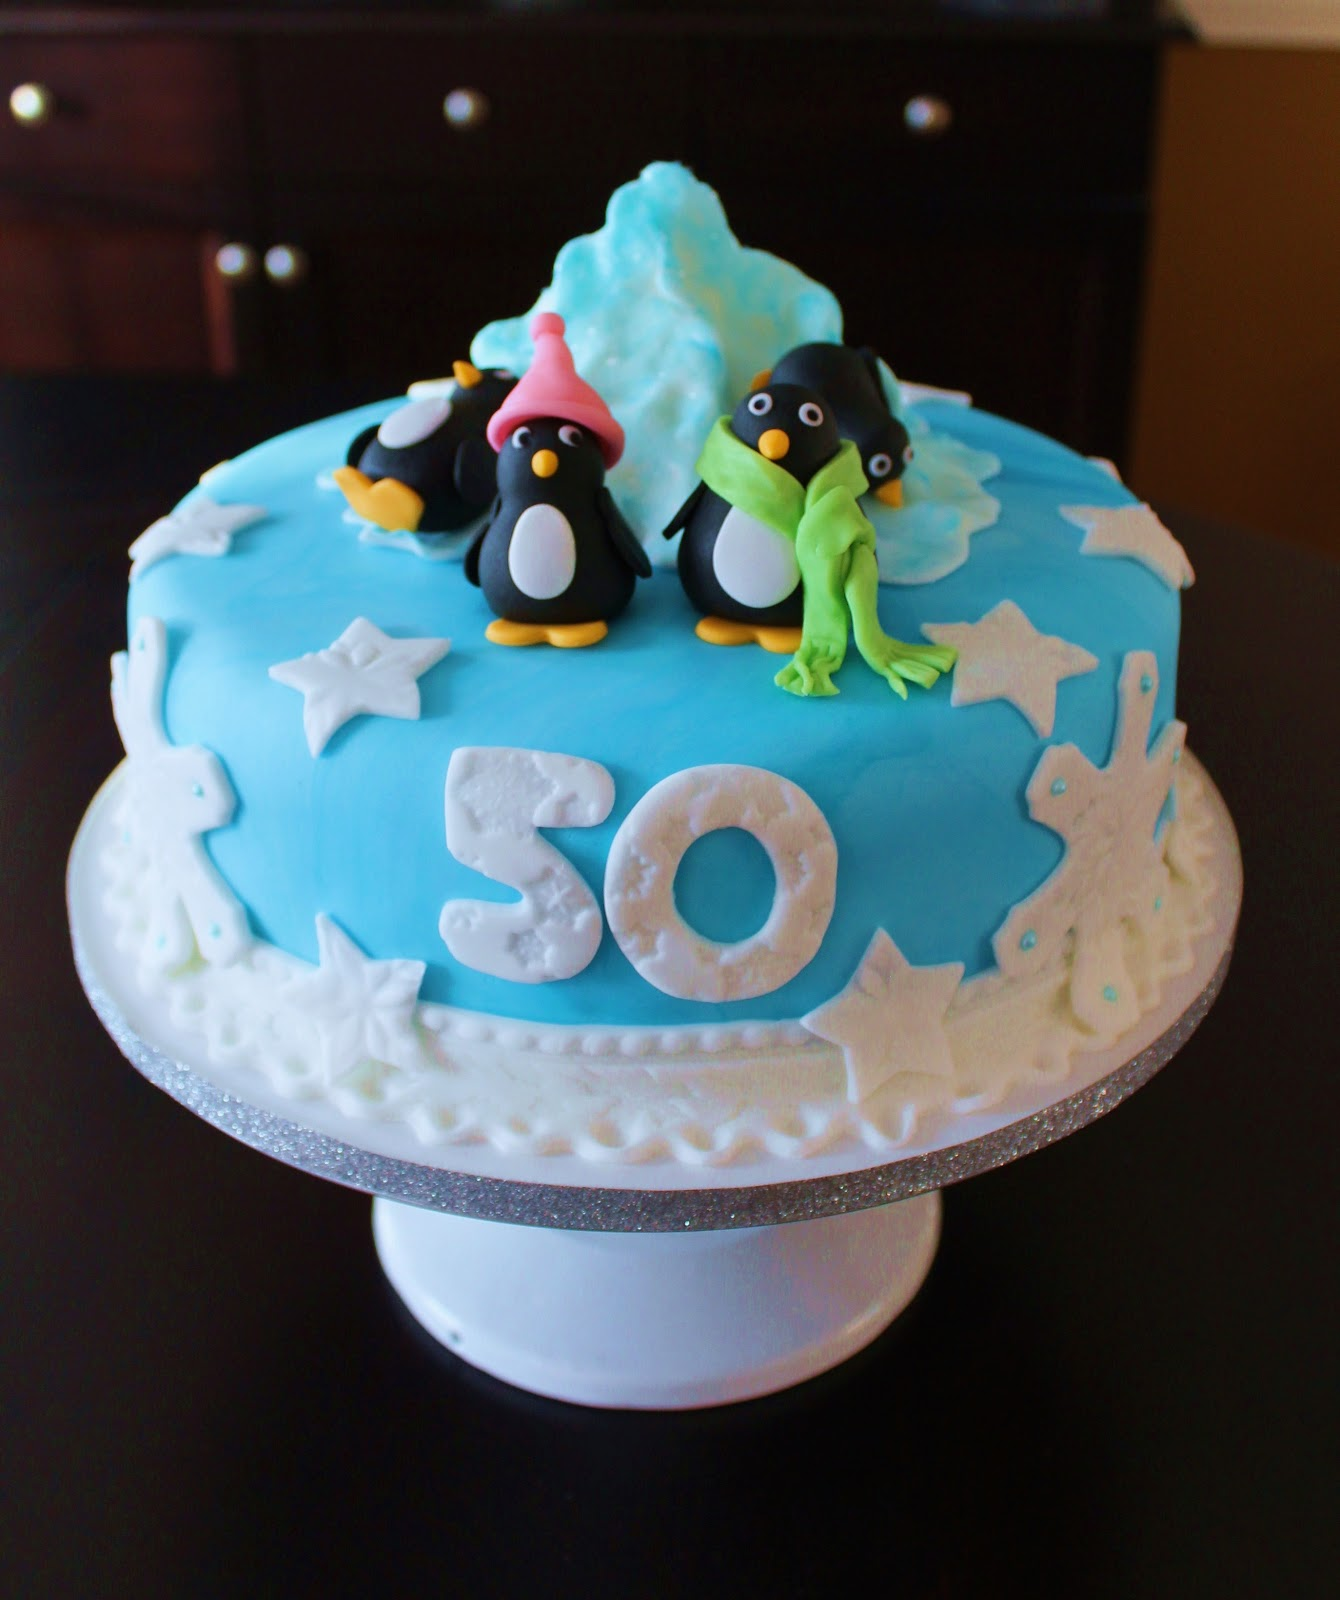 Creative Cakes By Lynn Penguin 50th Birthday Cake